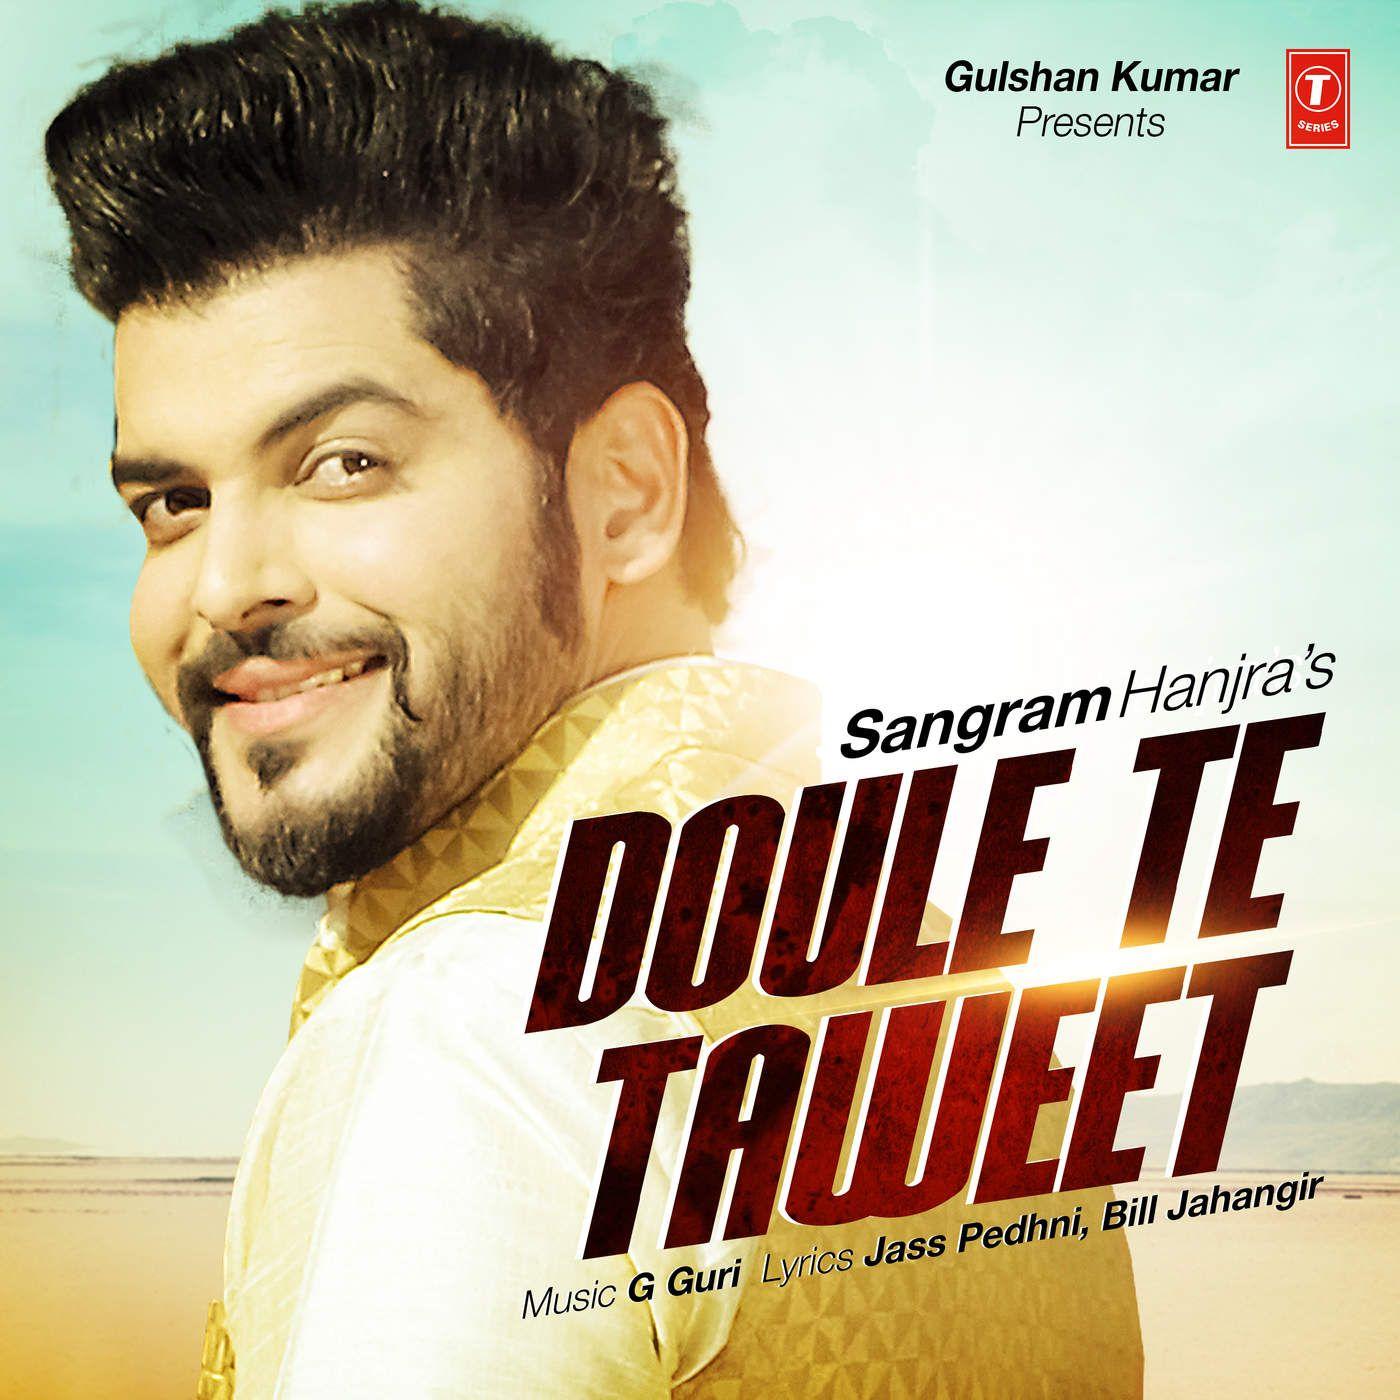 Jatt Sangram Hanjra Doule Te Taweet By Jaswal 320 Vbr Itunes Rip Mp3 M4a 2016 With Images Sangram Hanjra Mp3 Song Songs